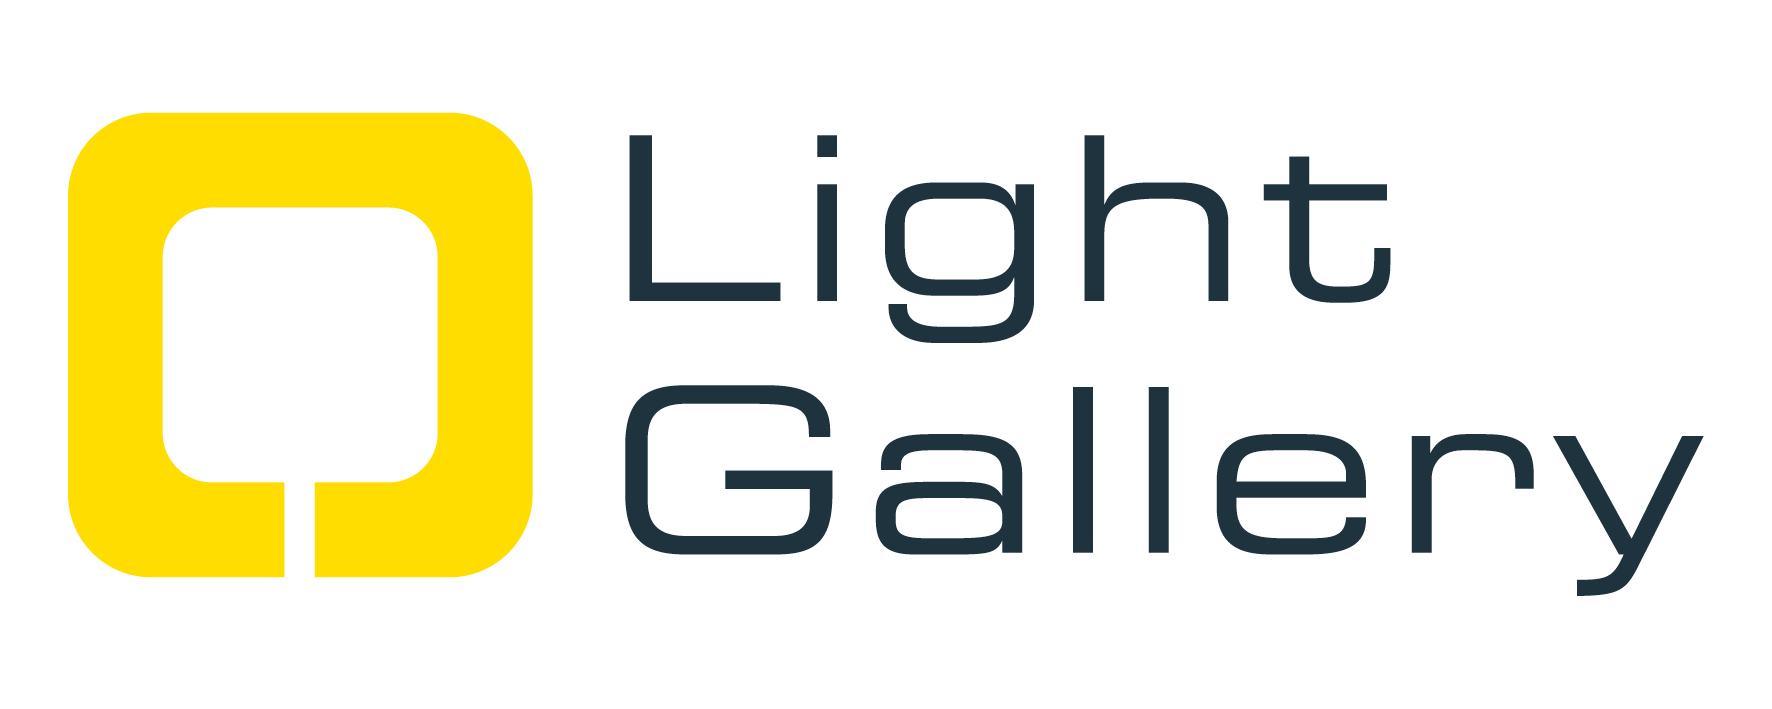 Light Gallery reviews| Lees klantreviews over www.lightgallery.com